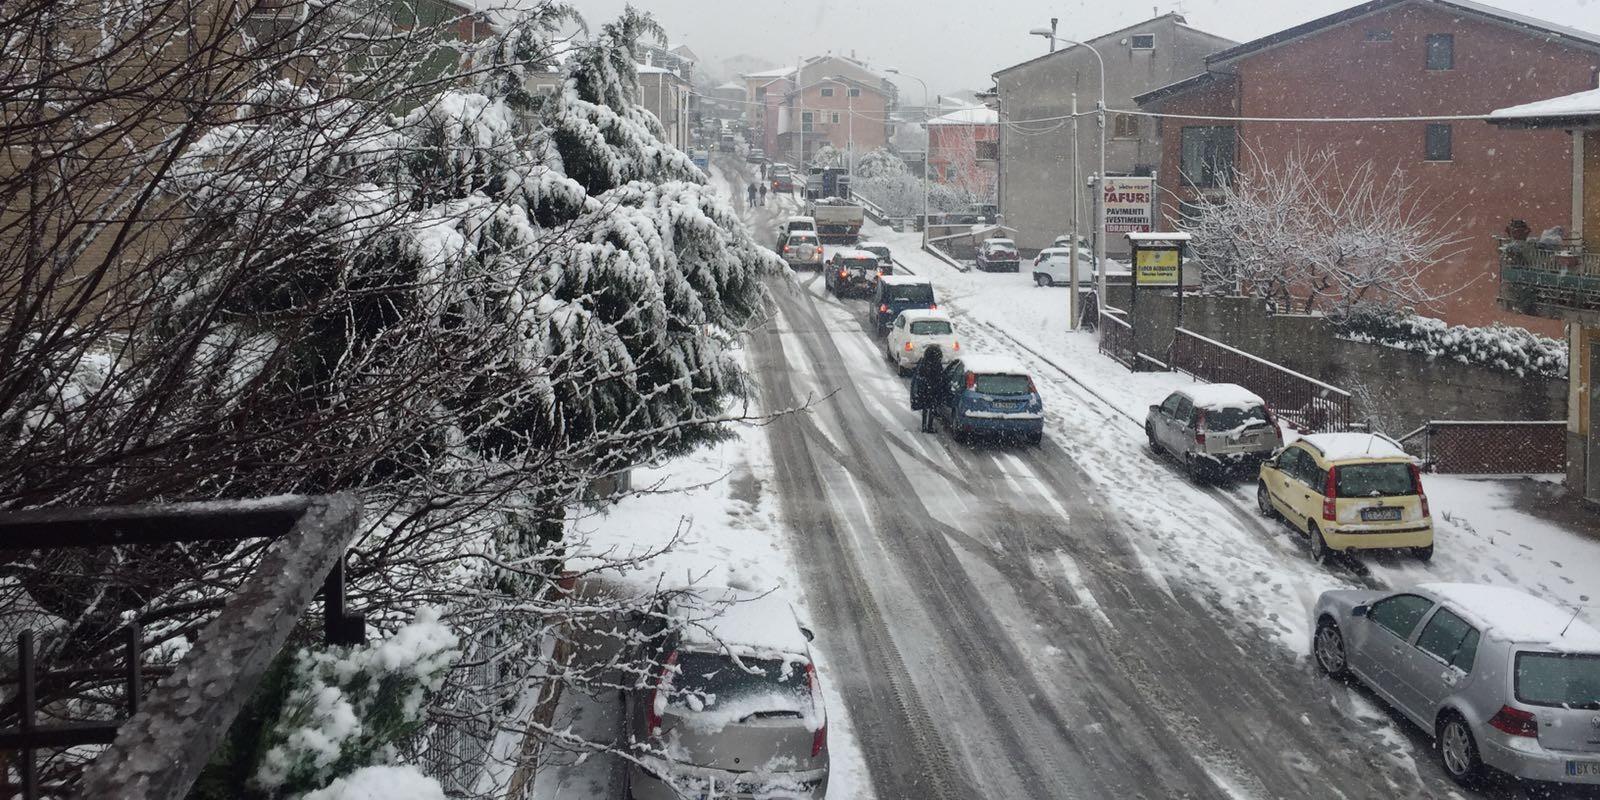 Sala consilina disagi per la neve in localit taverne for Foto di taverne arredate